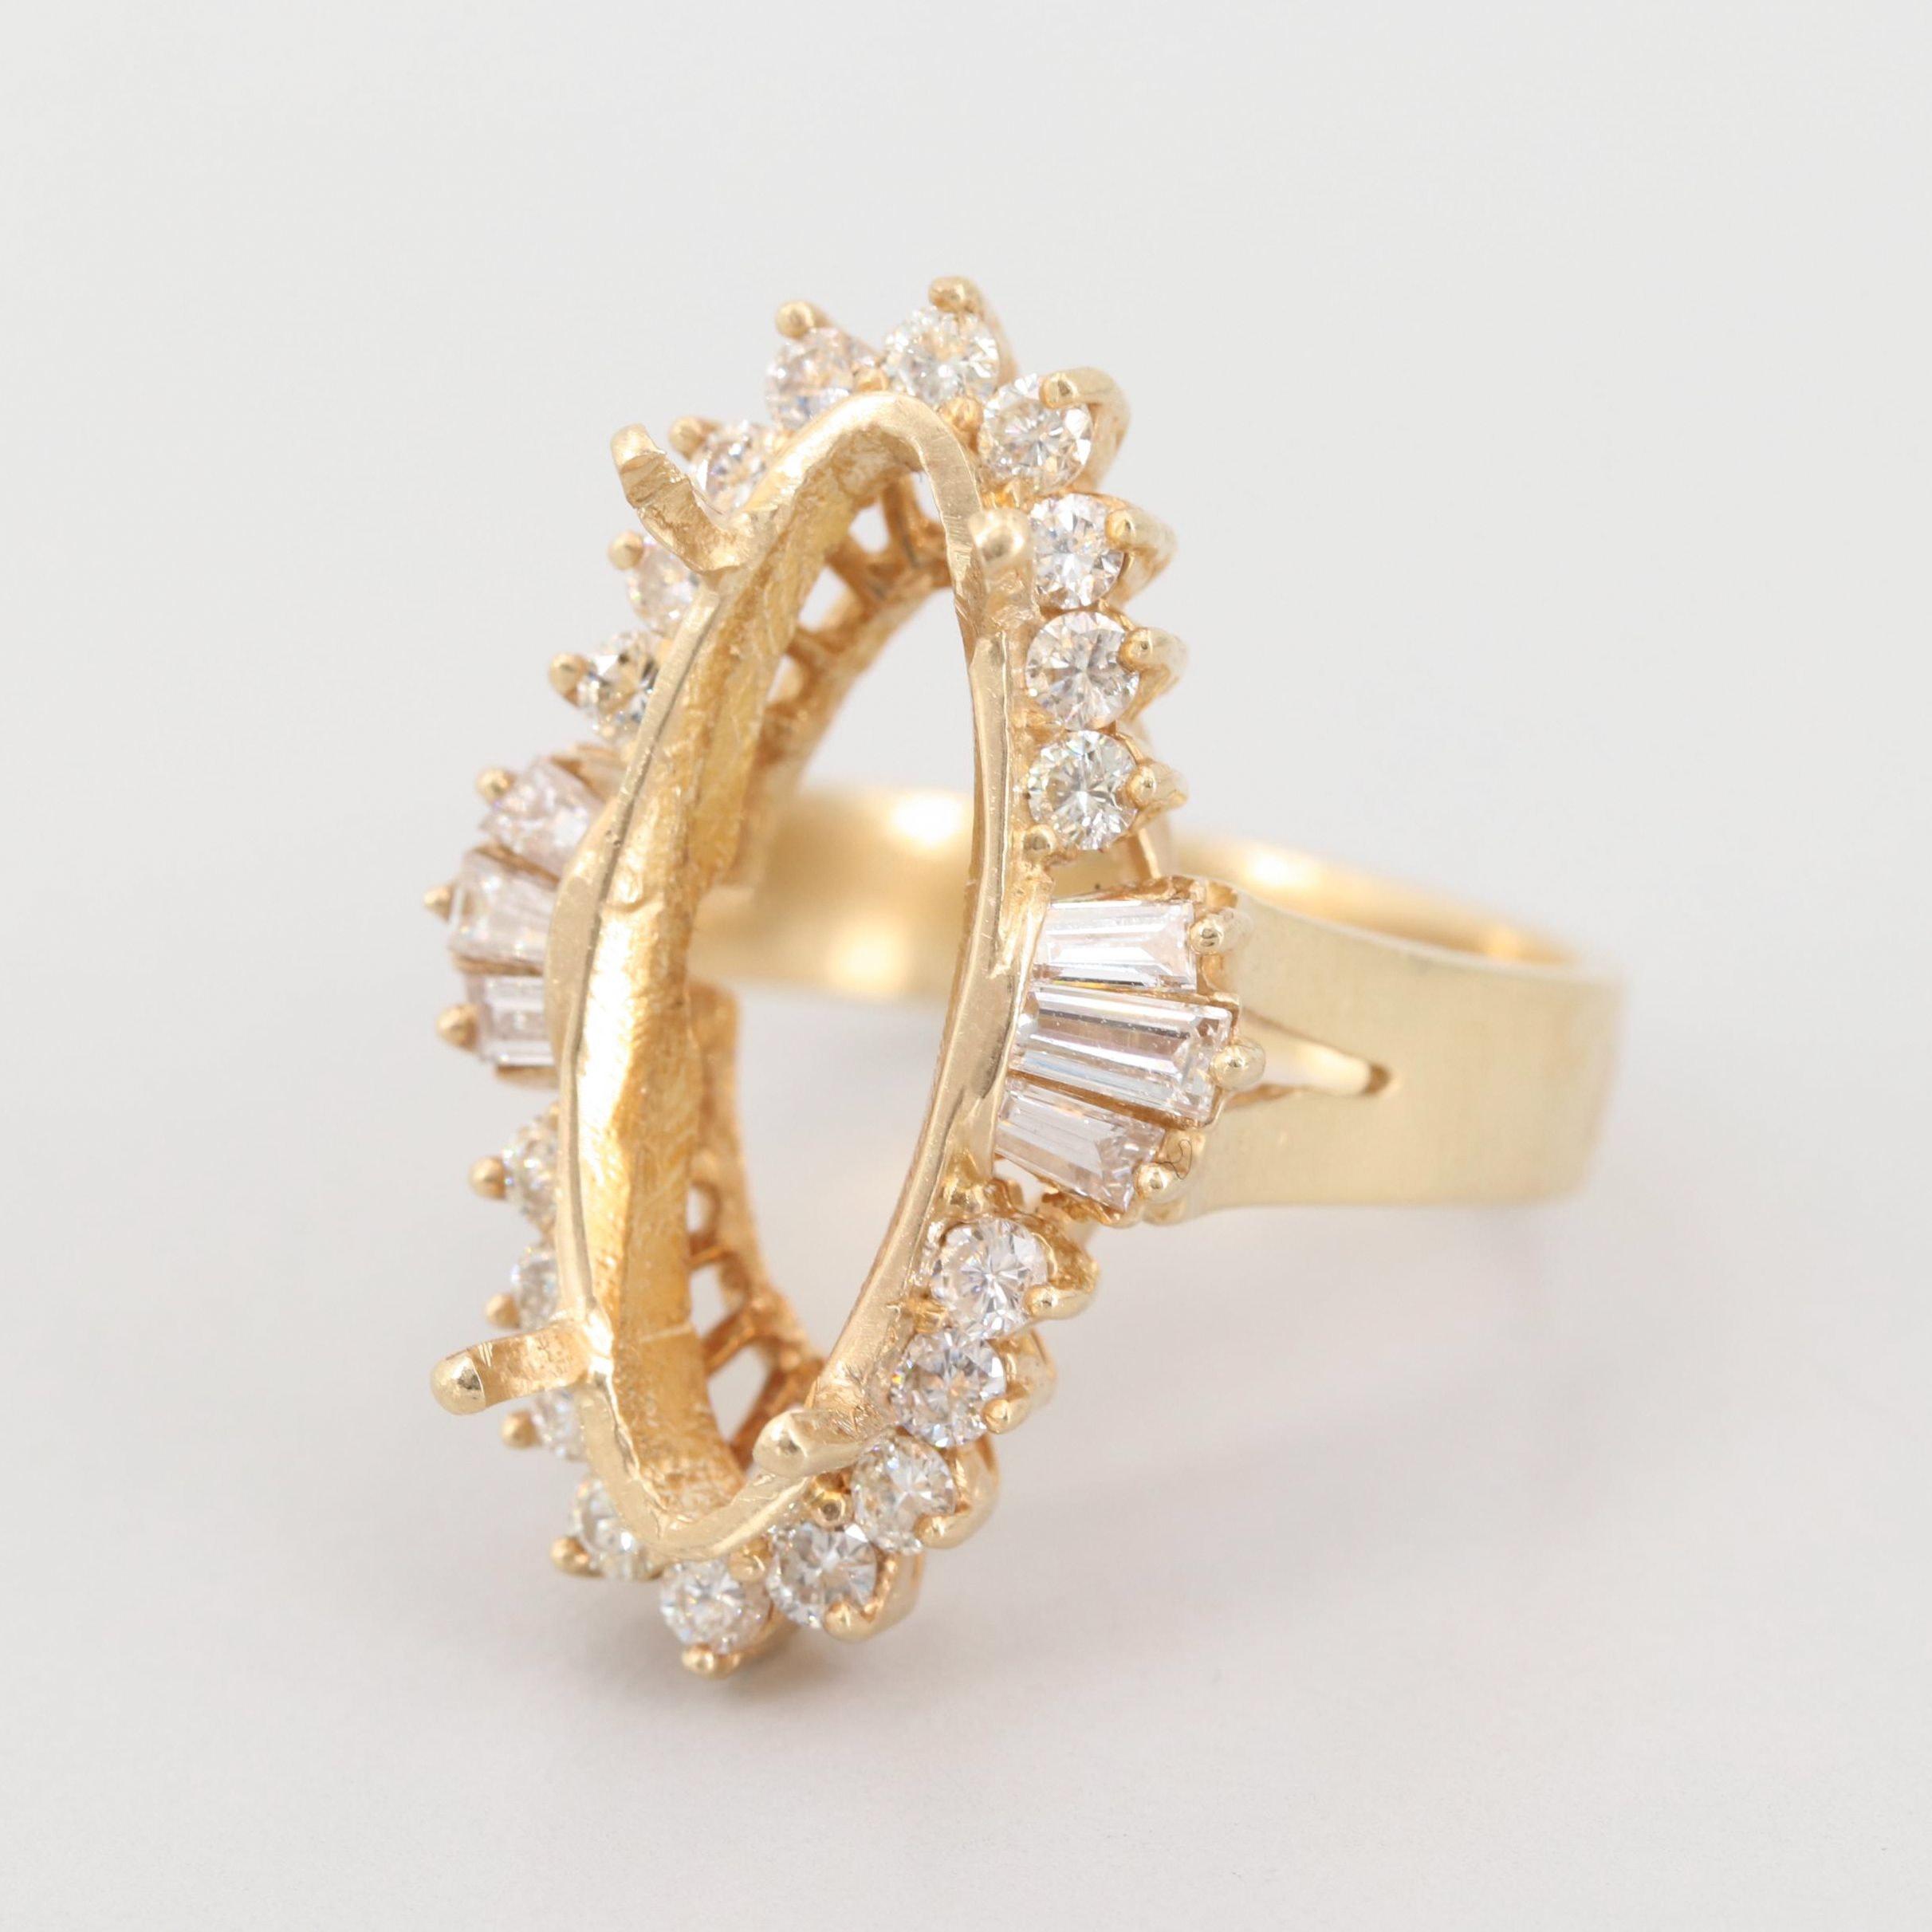 14K Yellow Gold 1.39 CTW Diamond Semi-Mount Ring